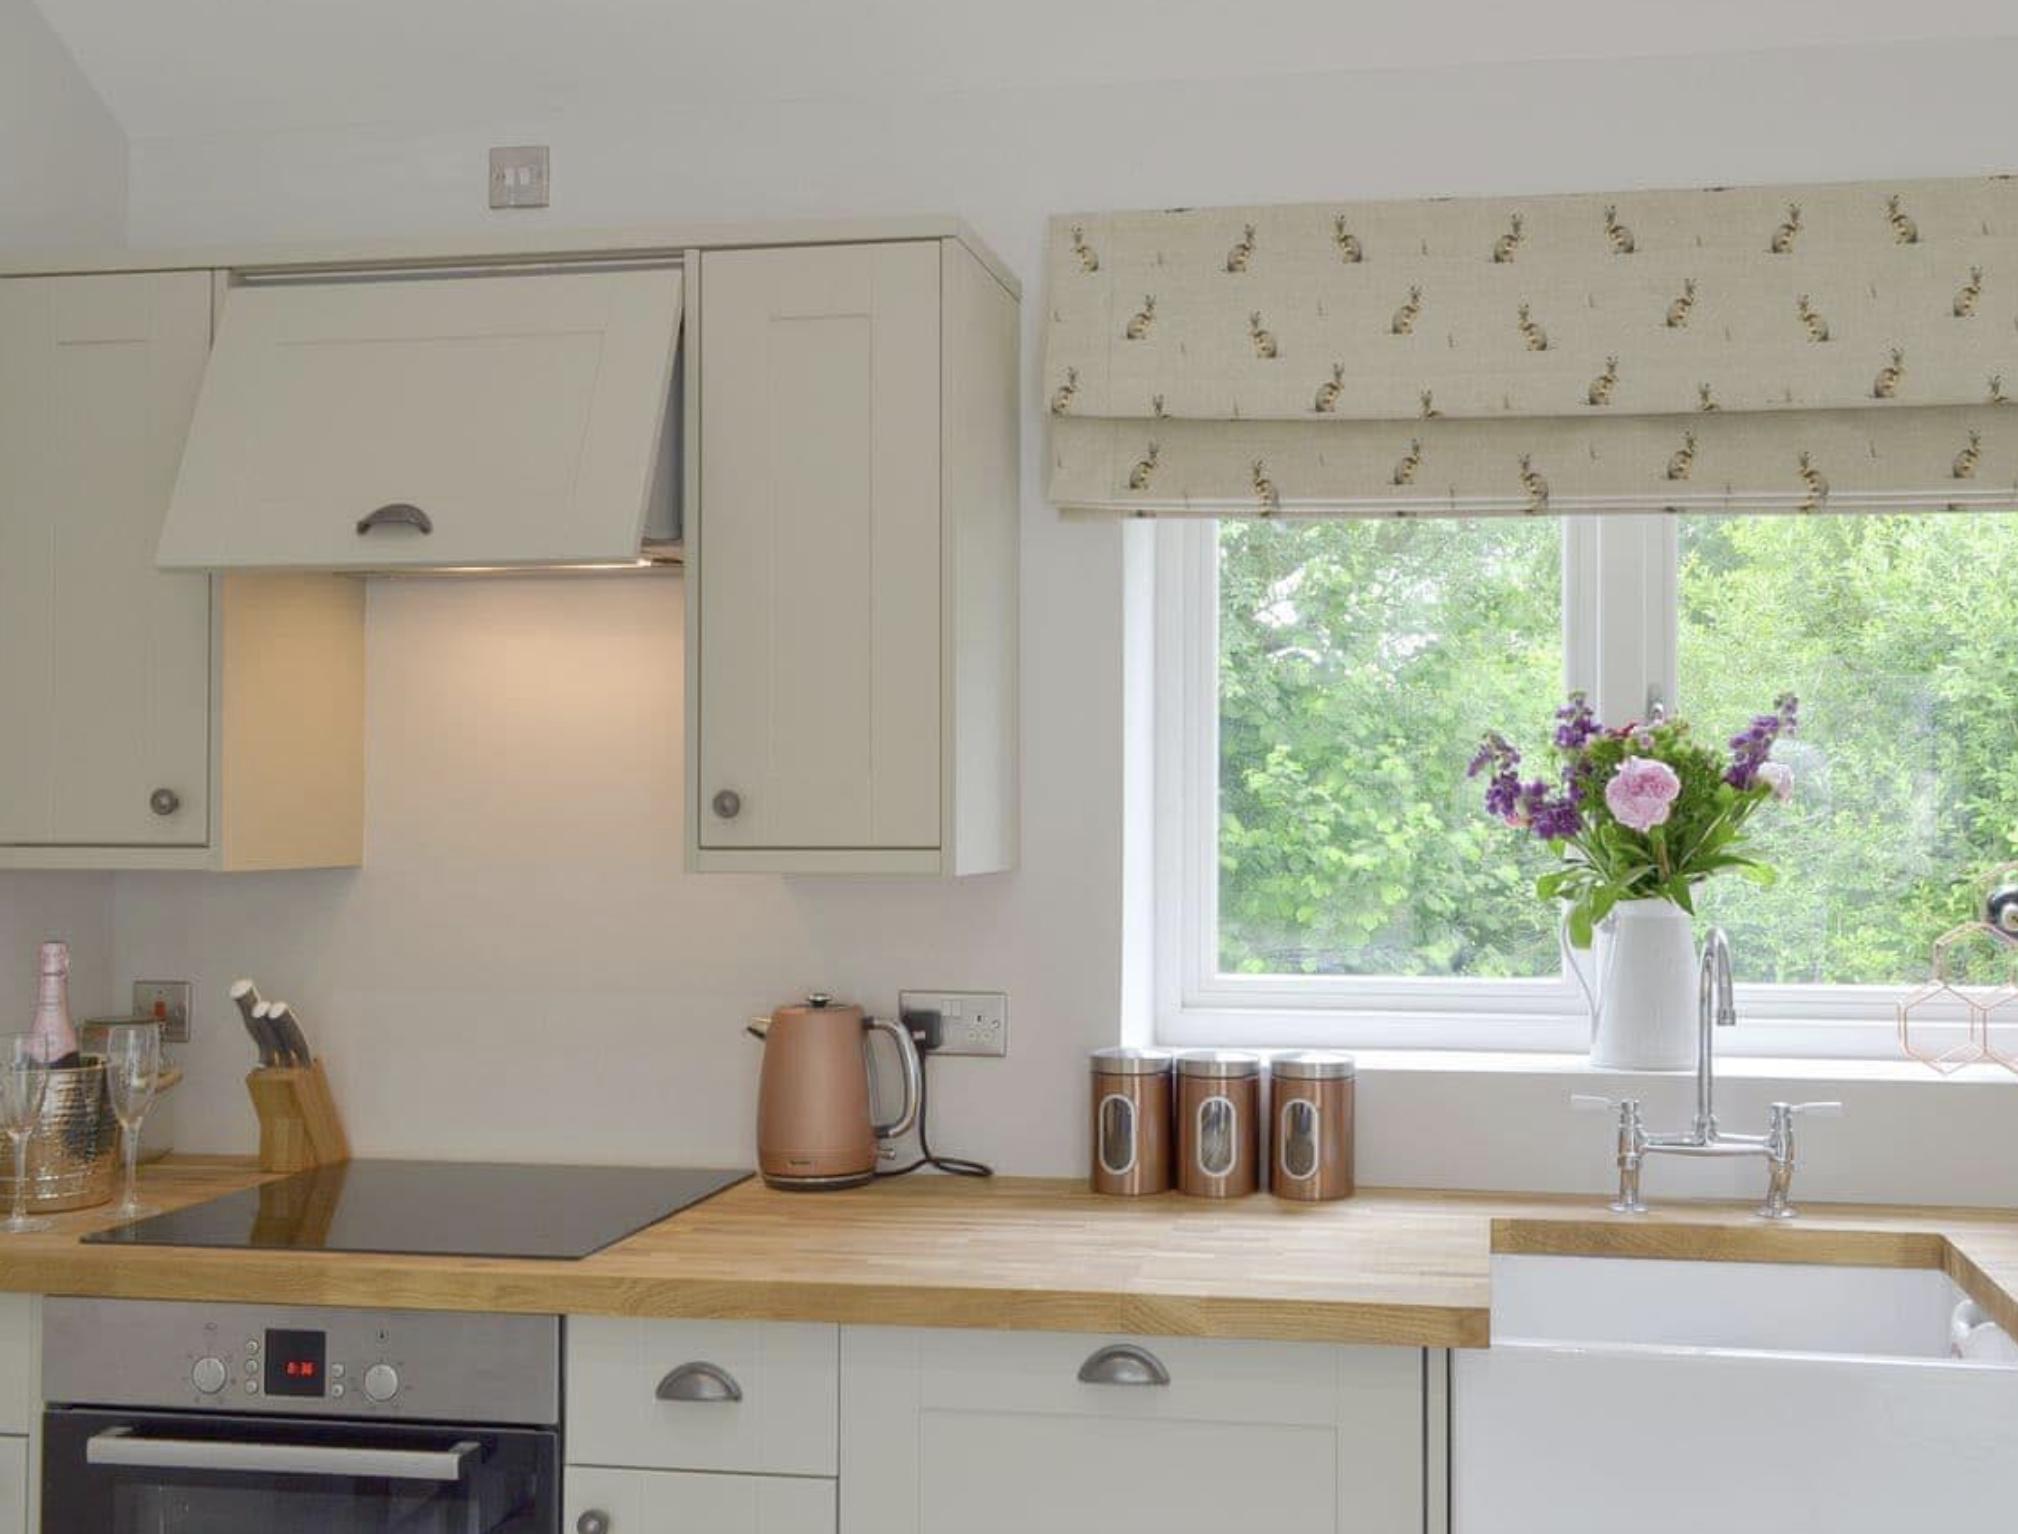 Property Maintenance Mansfield, Worksop and Nottinghamshire - C P Rose Building Services Ltd